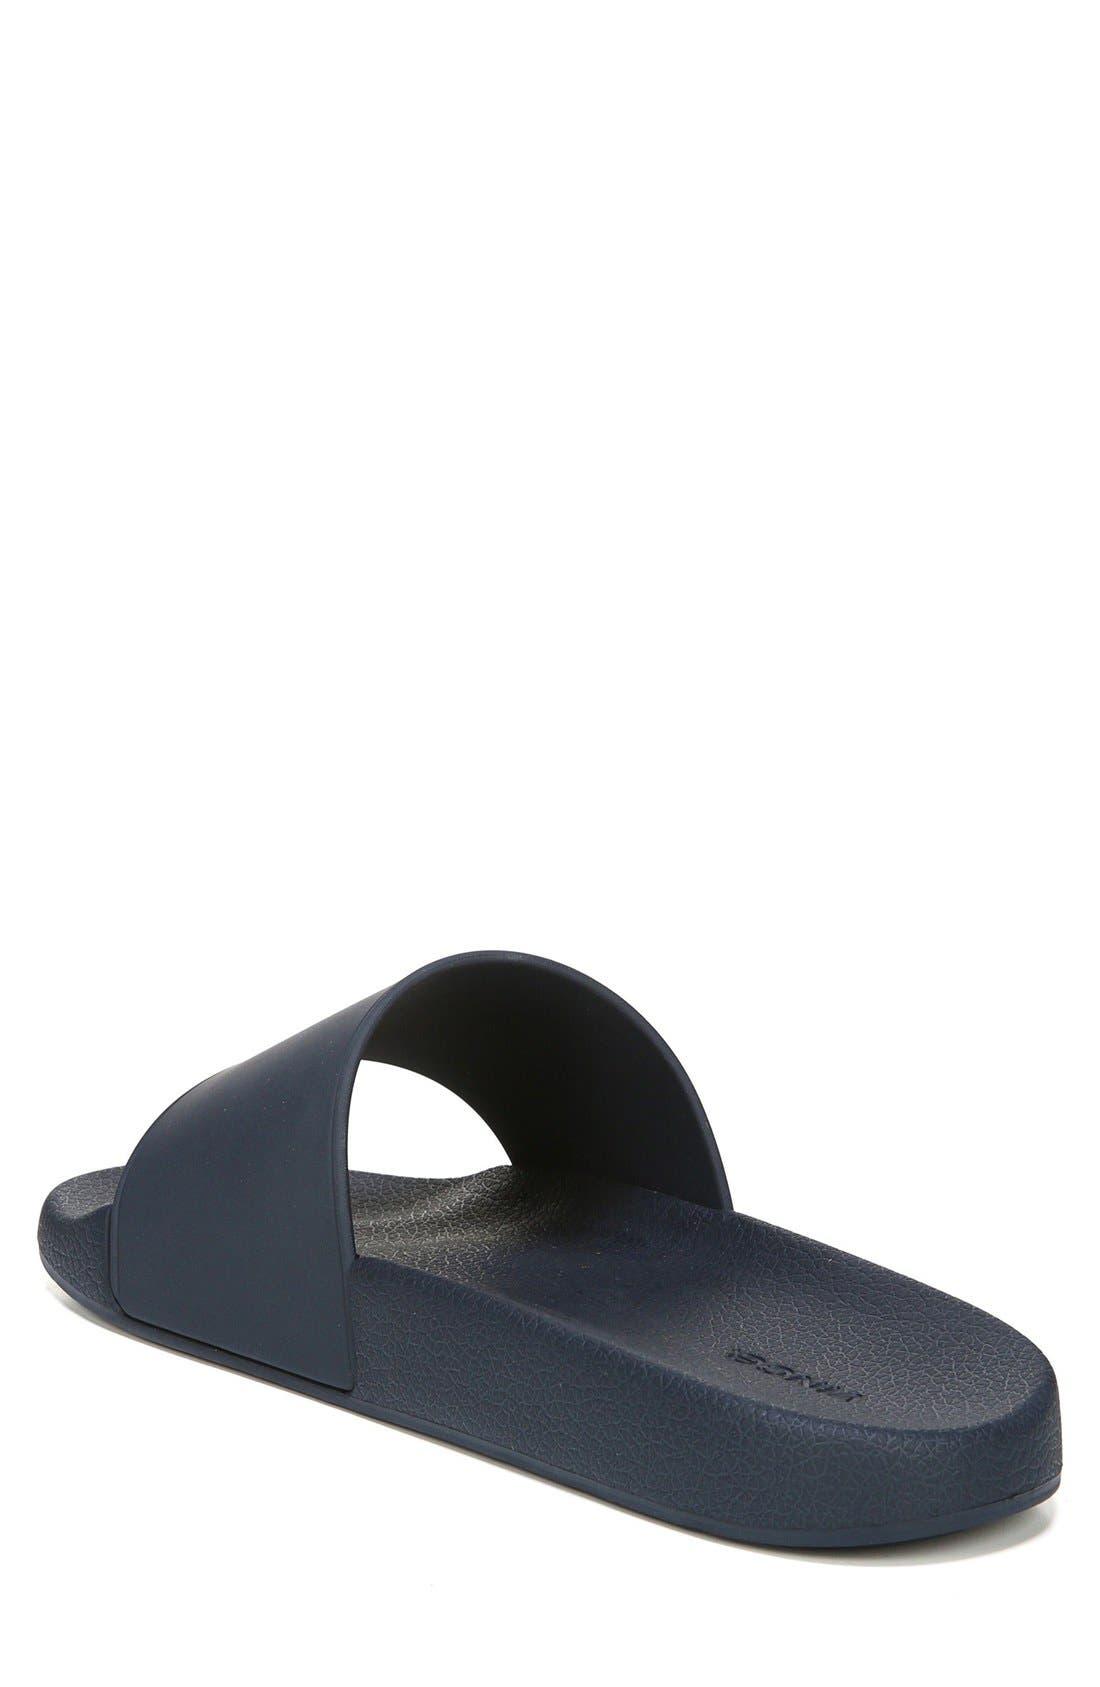 Westcoast Sport Sandal,                             Alternate thumbnail 2, color,                             Coastal Blue